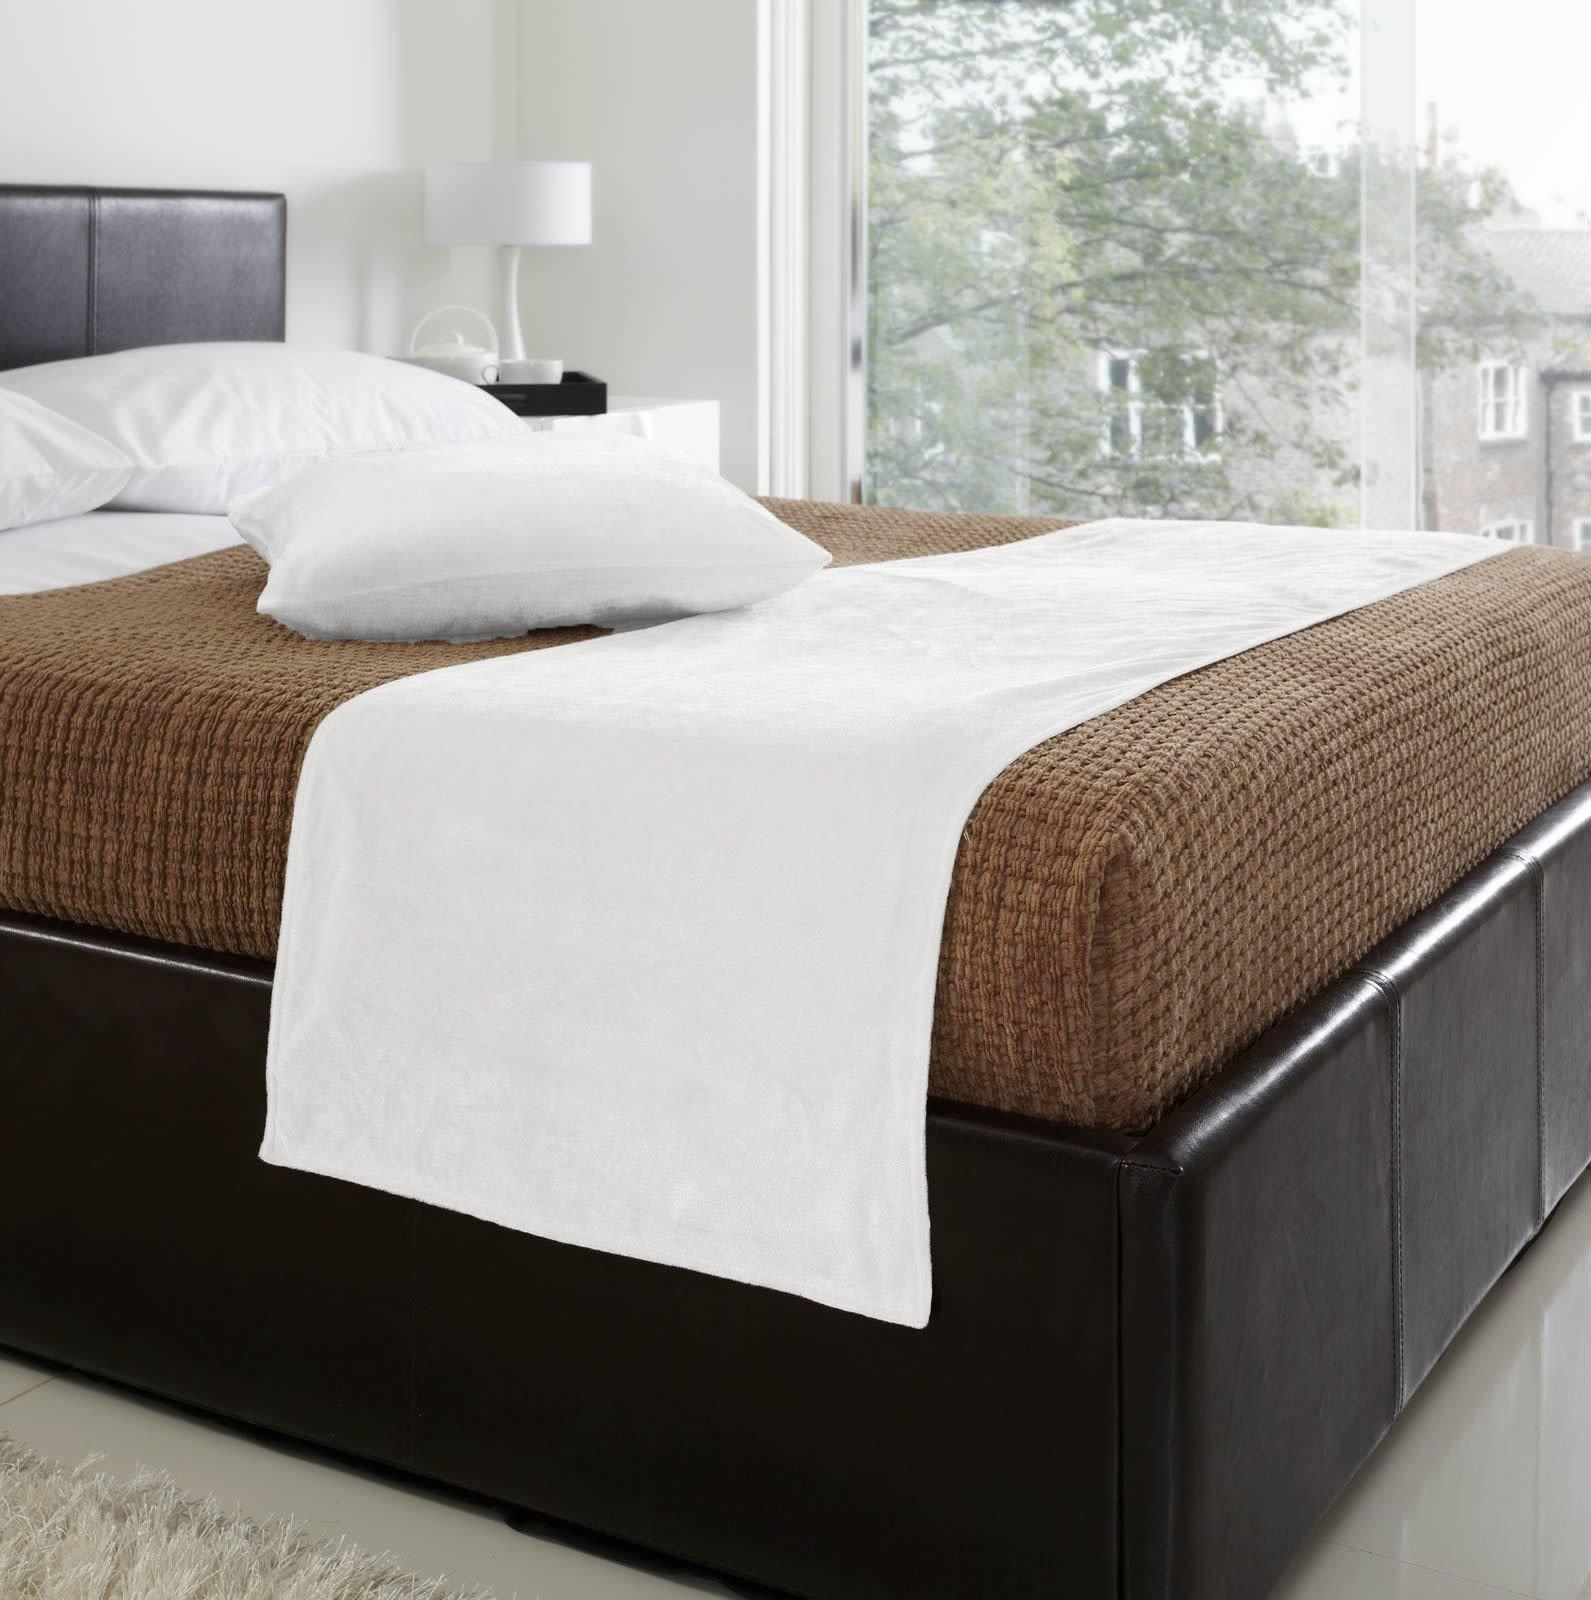 HealthyBusiness1 3 Pc Velvet Bed Runner set Bed Runner + 2 Pc 18'' x 18'' Cushion Covers Wedding bedding (white, 50x240cm/19.6x94.4 inch for 1.8 m bed)